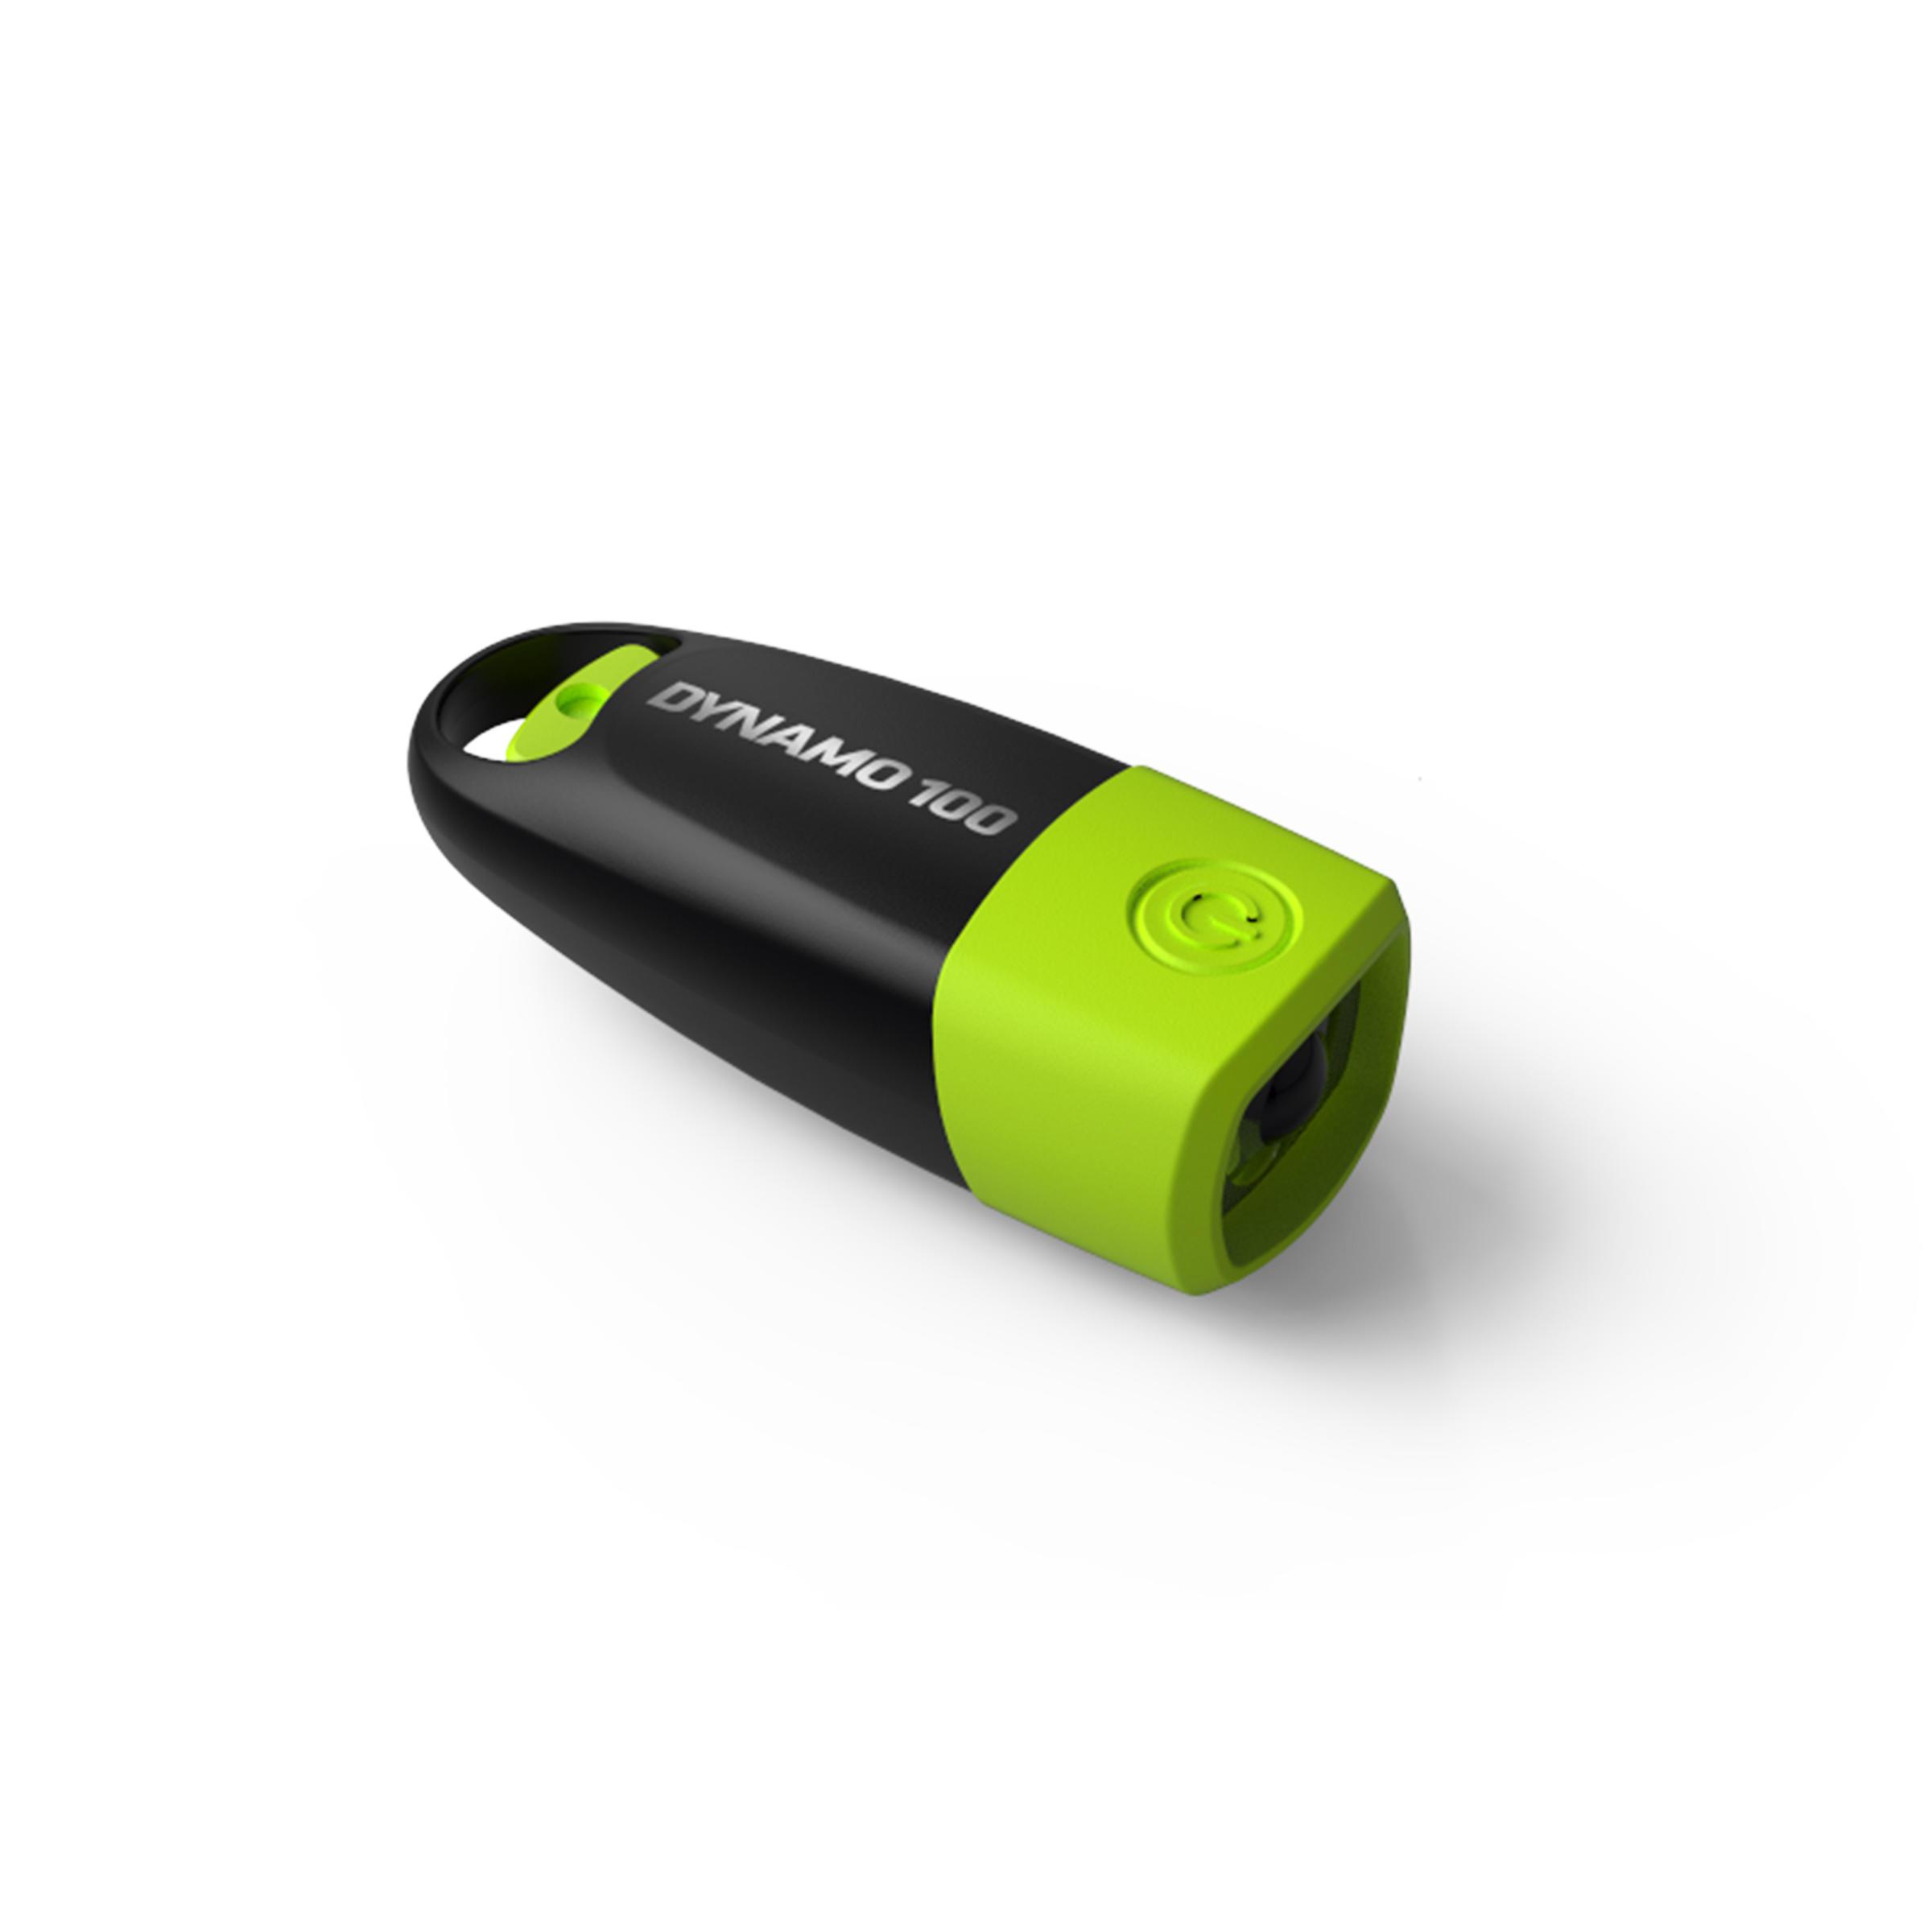 Forclaz Autonome zaklamp Dynamo 100 groen - 15 lumen